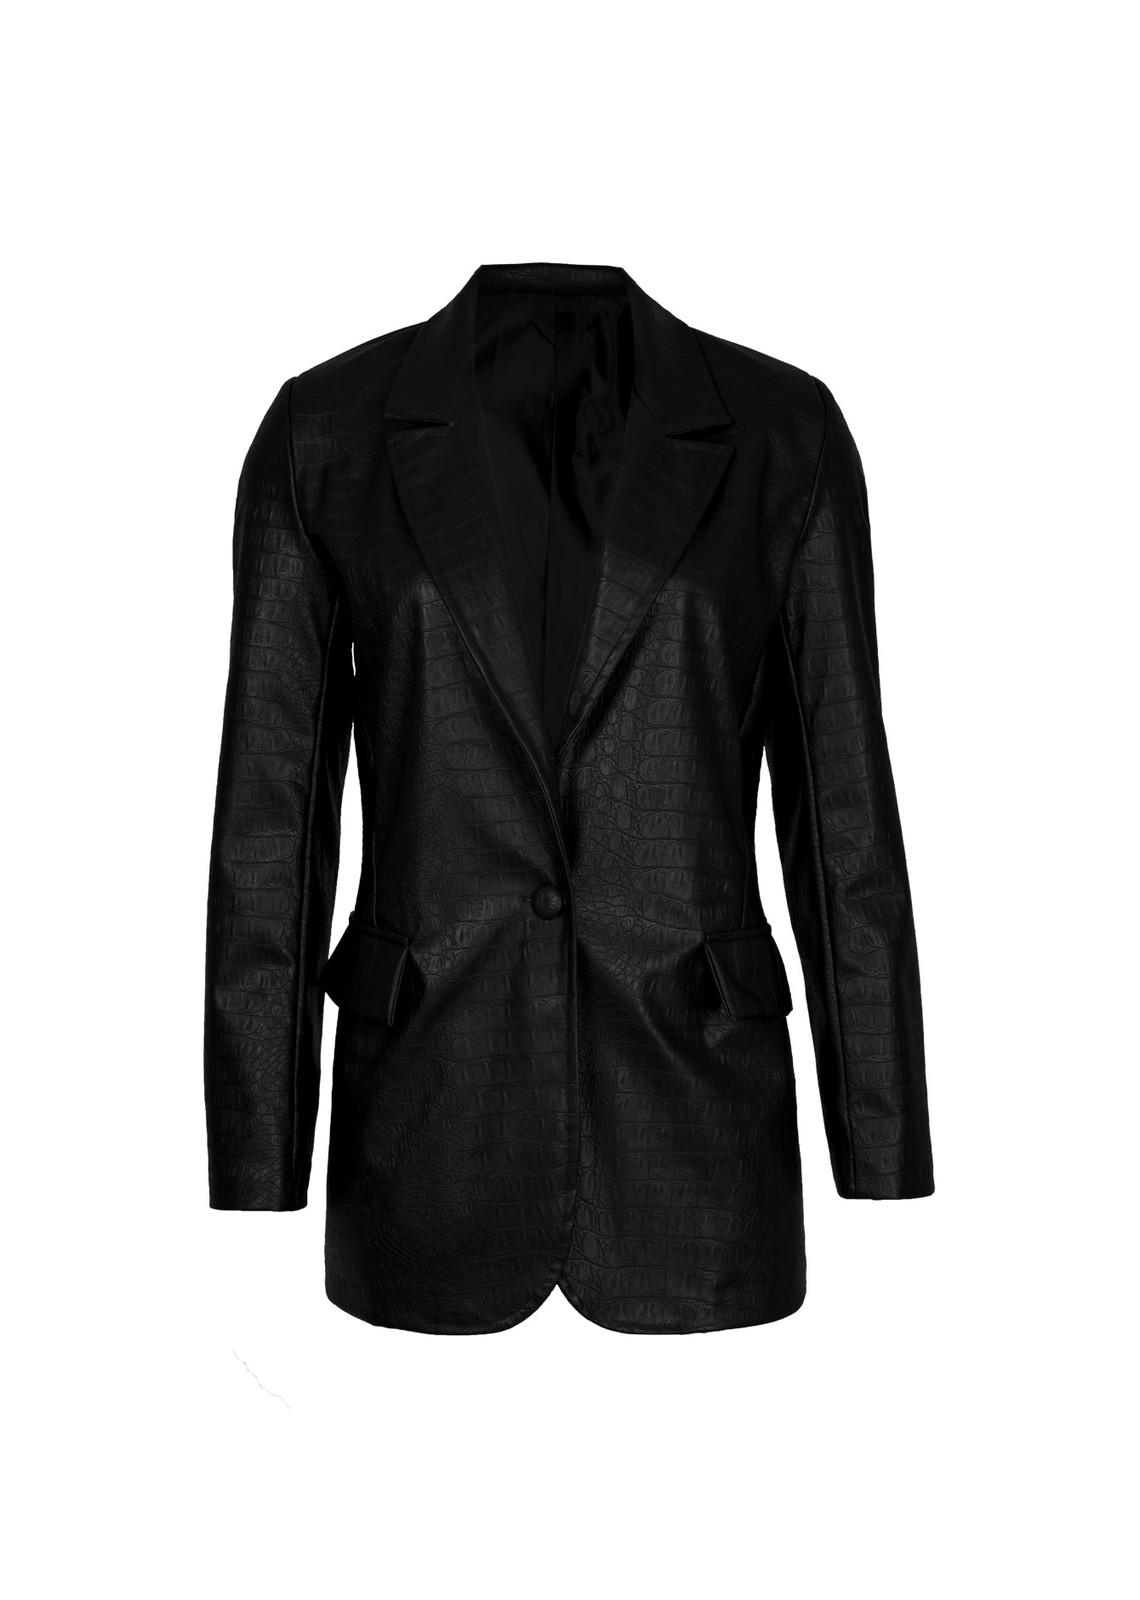 Snake jacket black